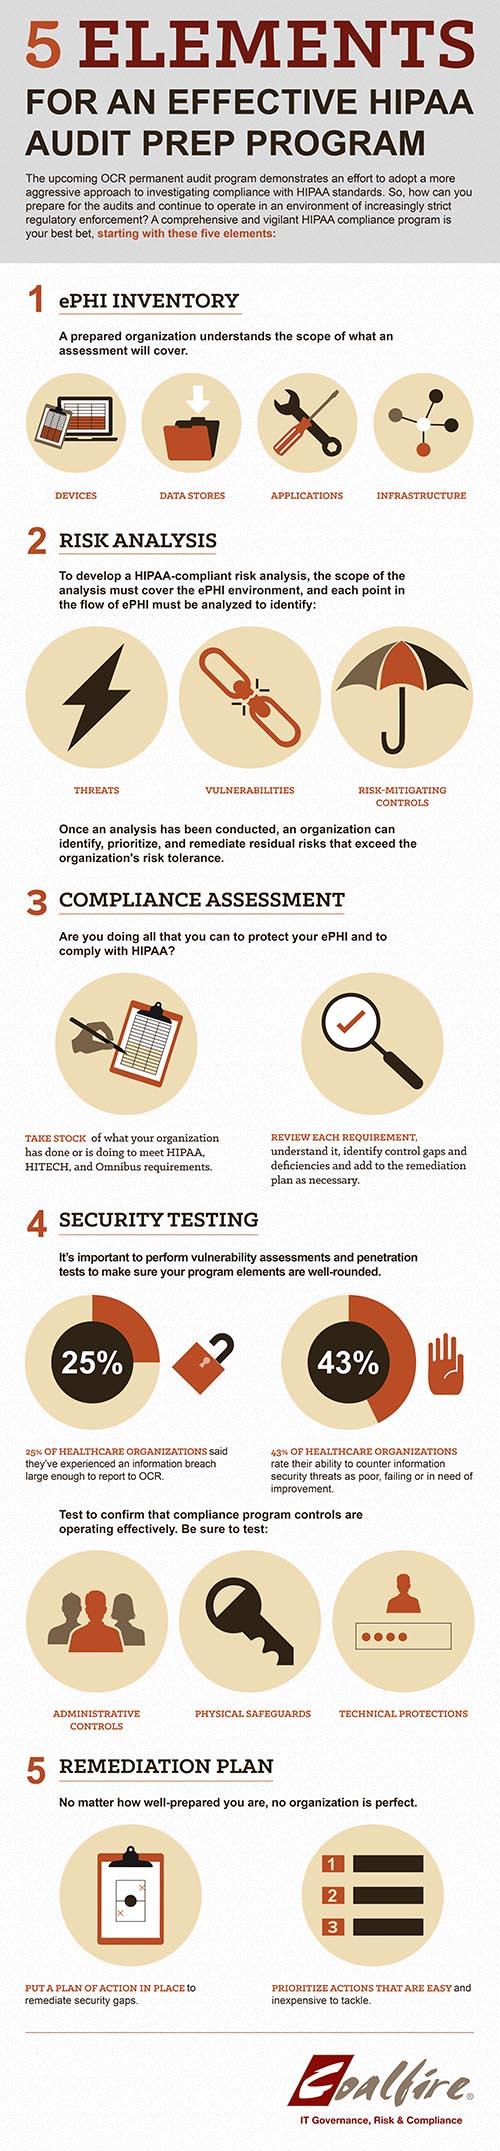 Coalfire_Infographic_HIPAA_audit